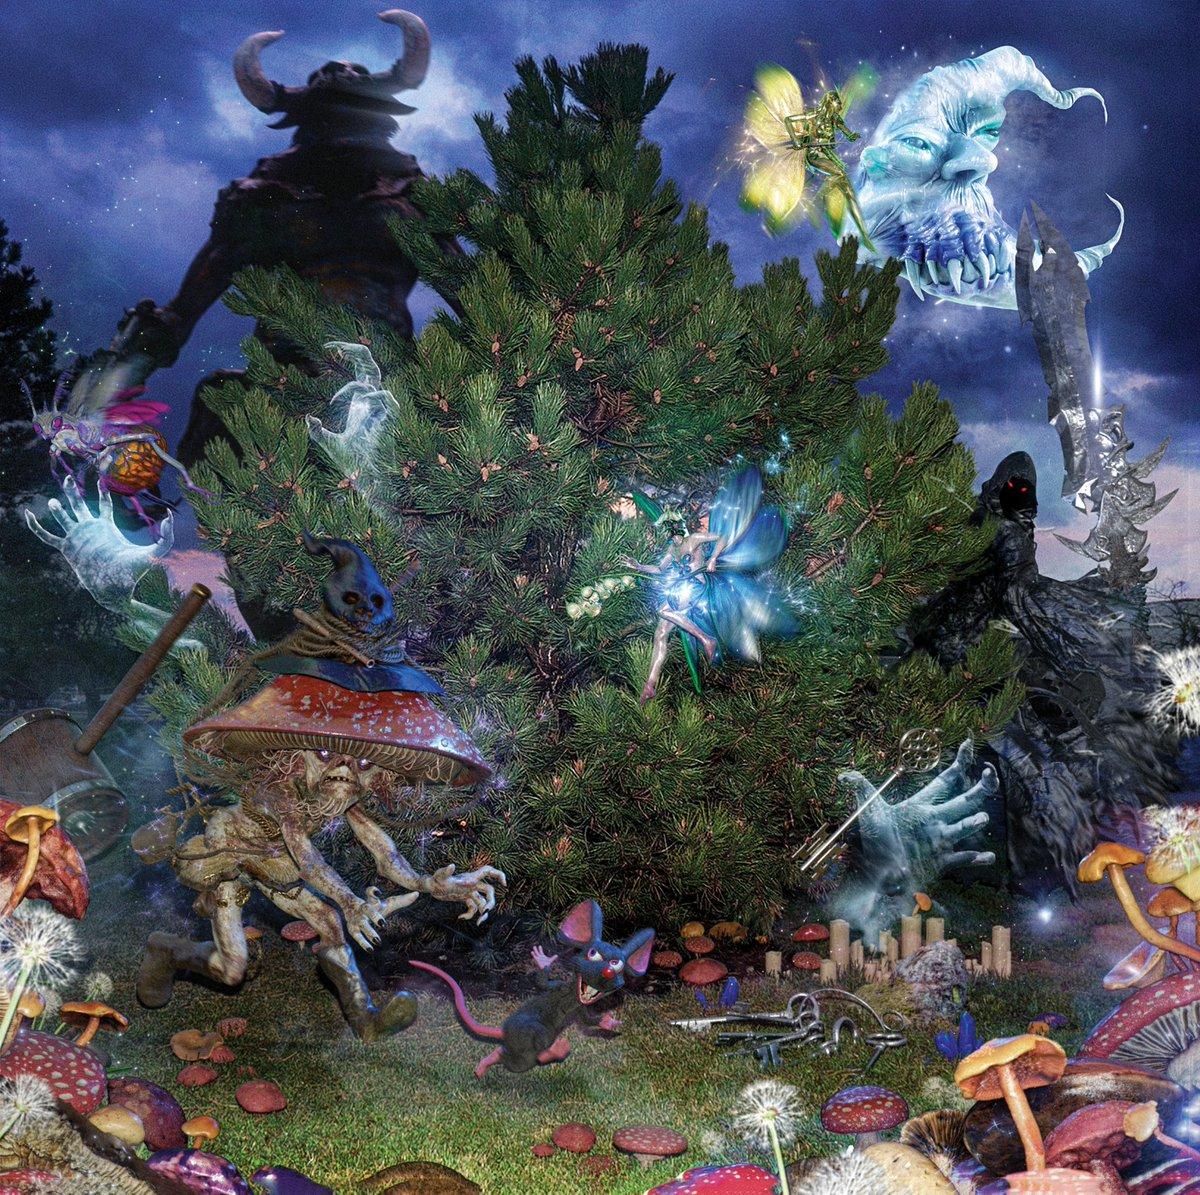 1000 gecs and The Tree of Clues ..............🧩..🌲 ............. july 10 on big beat records ... 🔎 pre0rder tonight @ midnight est ⏳... ⌛️.. ... 100gecs.com .